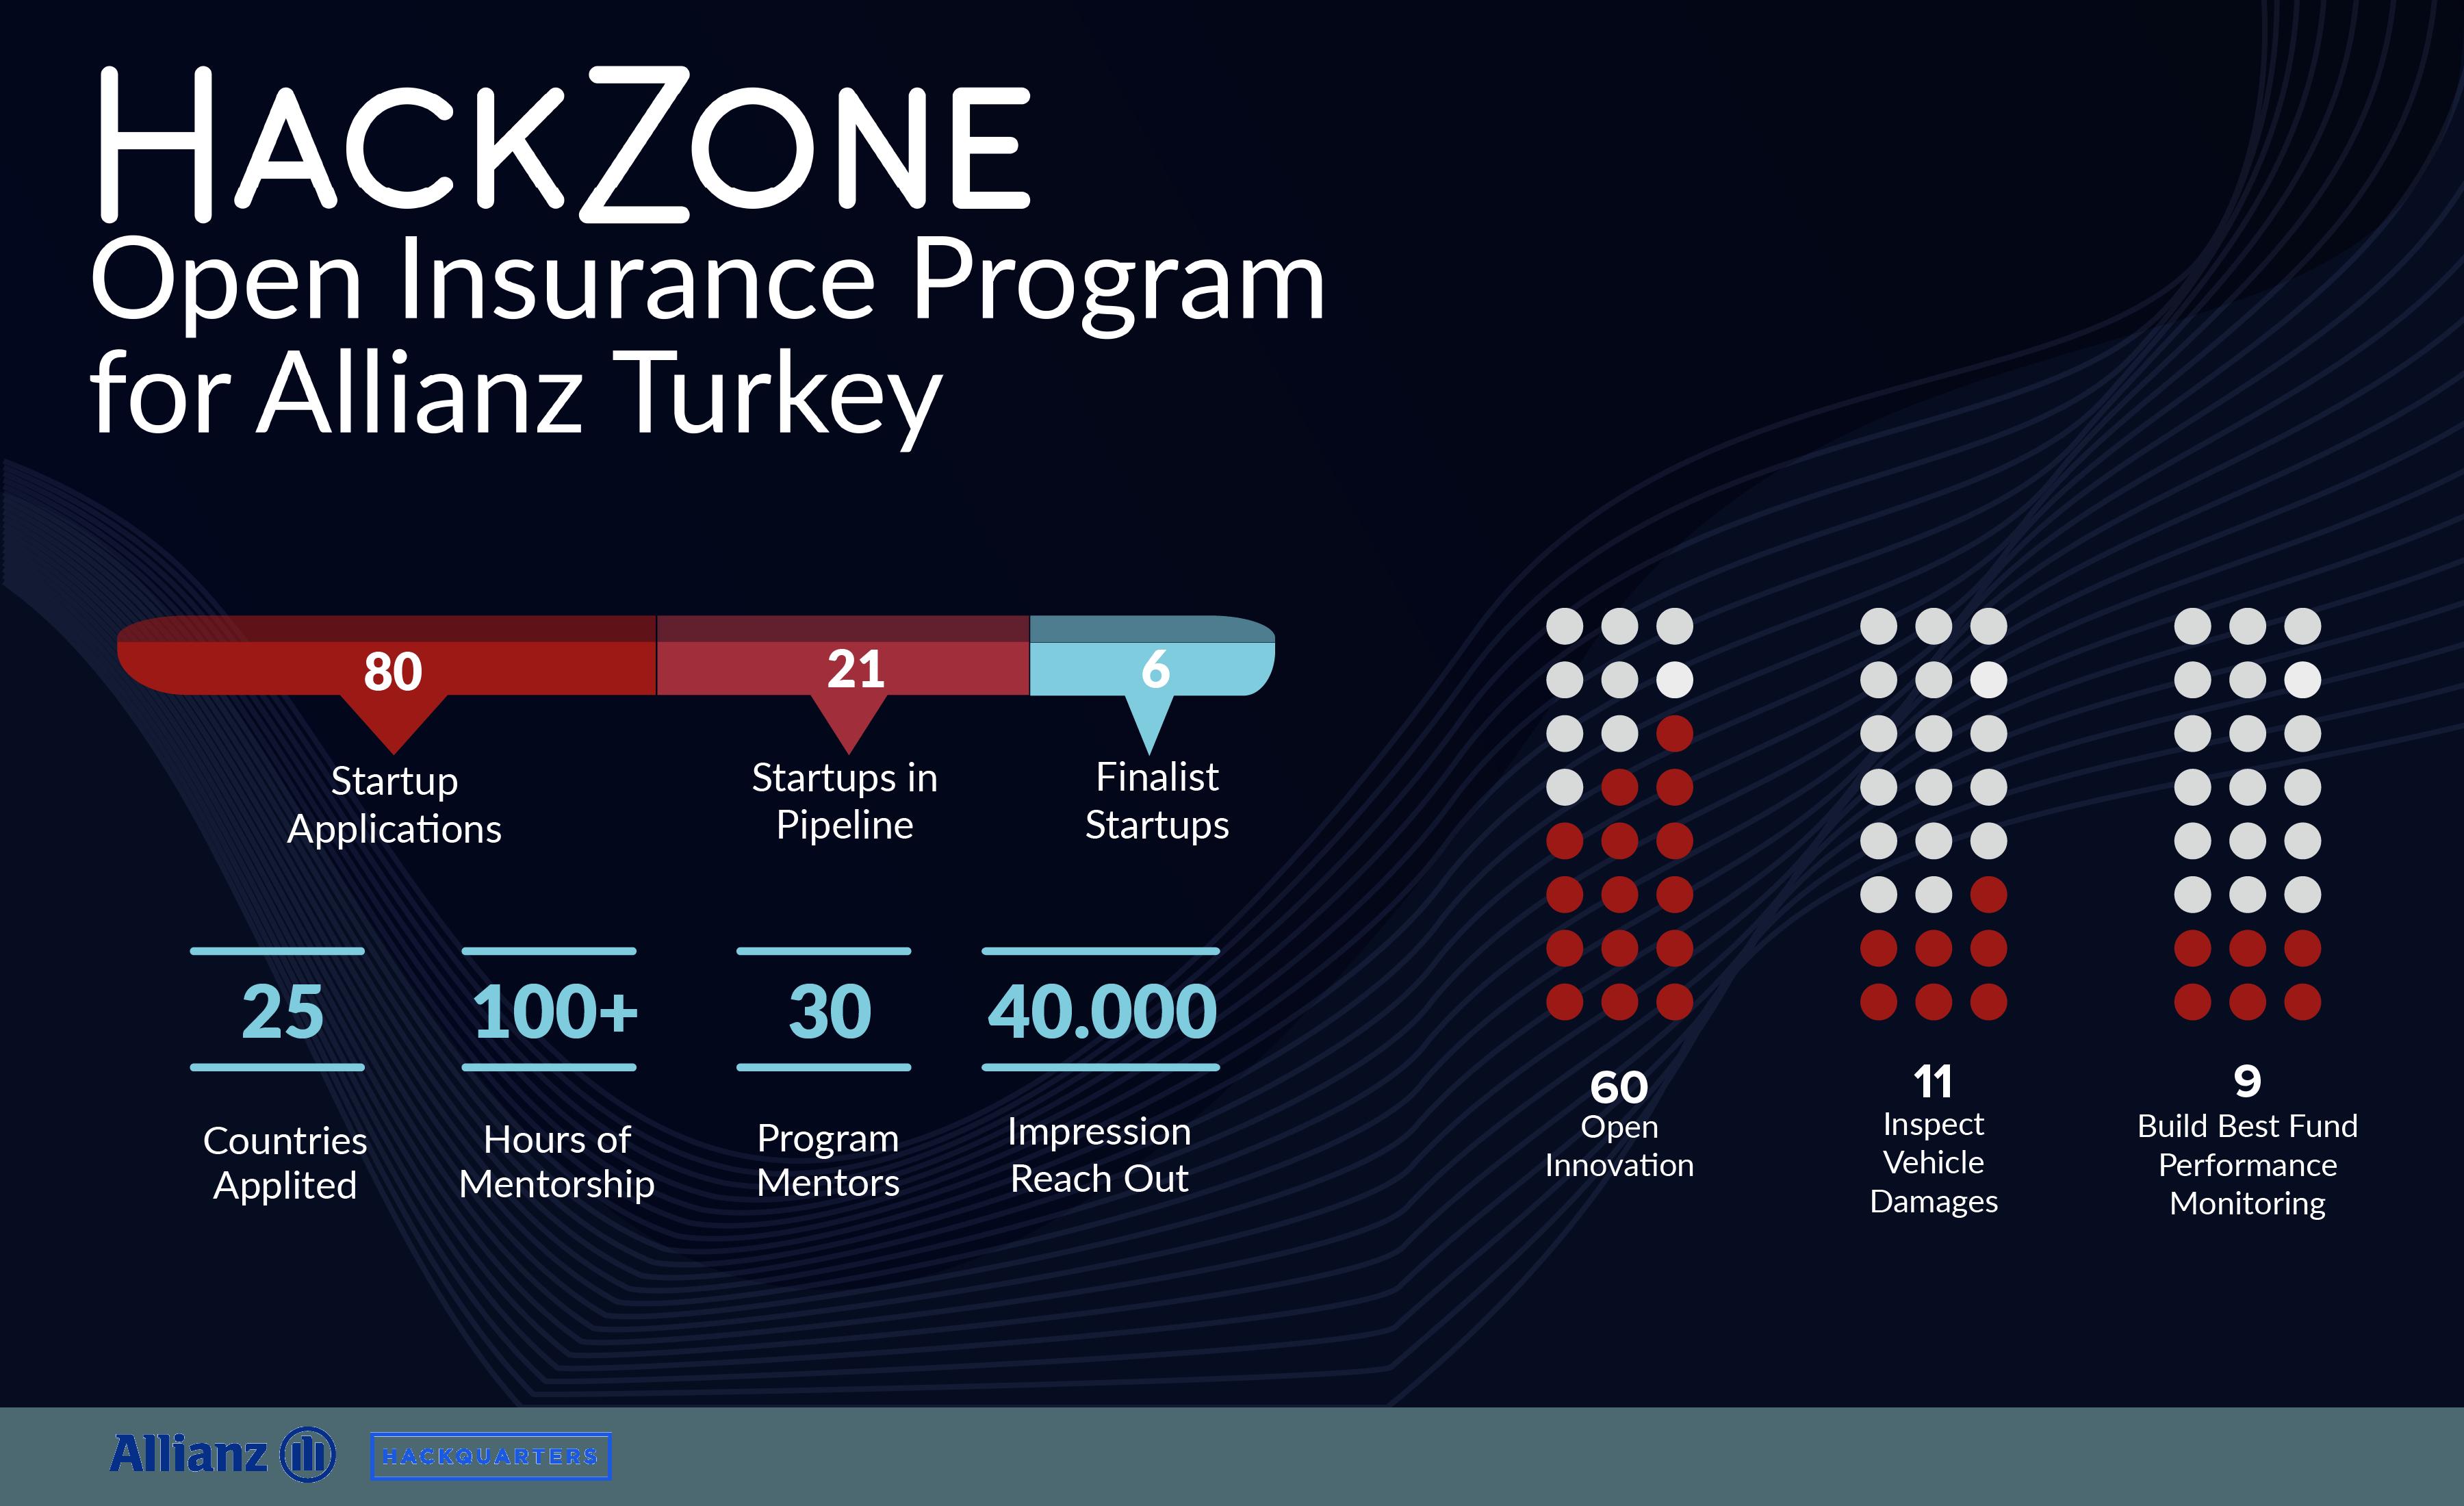 Hackzone Demo Day: Reshaping Insurance Sector through Open Insurance